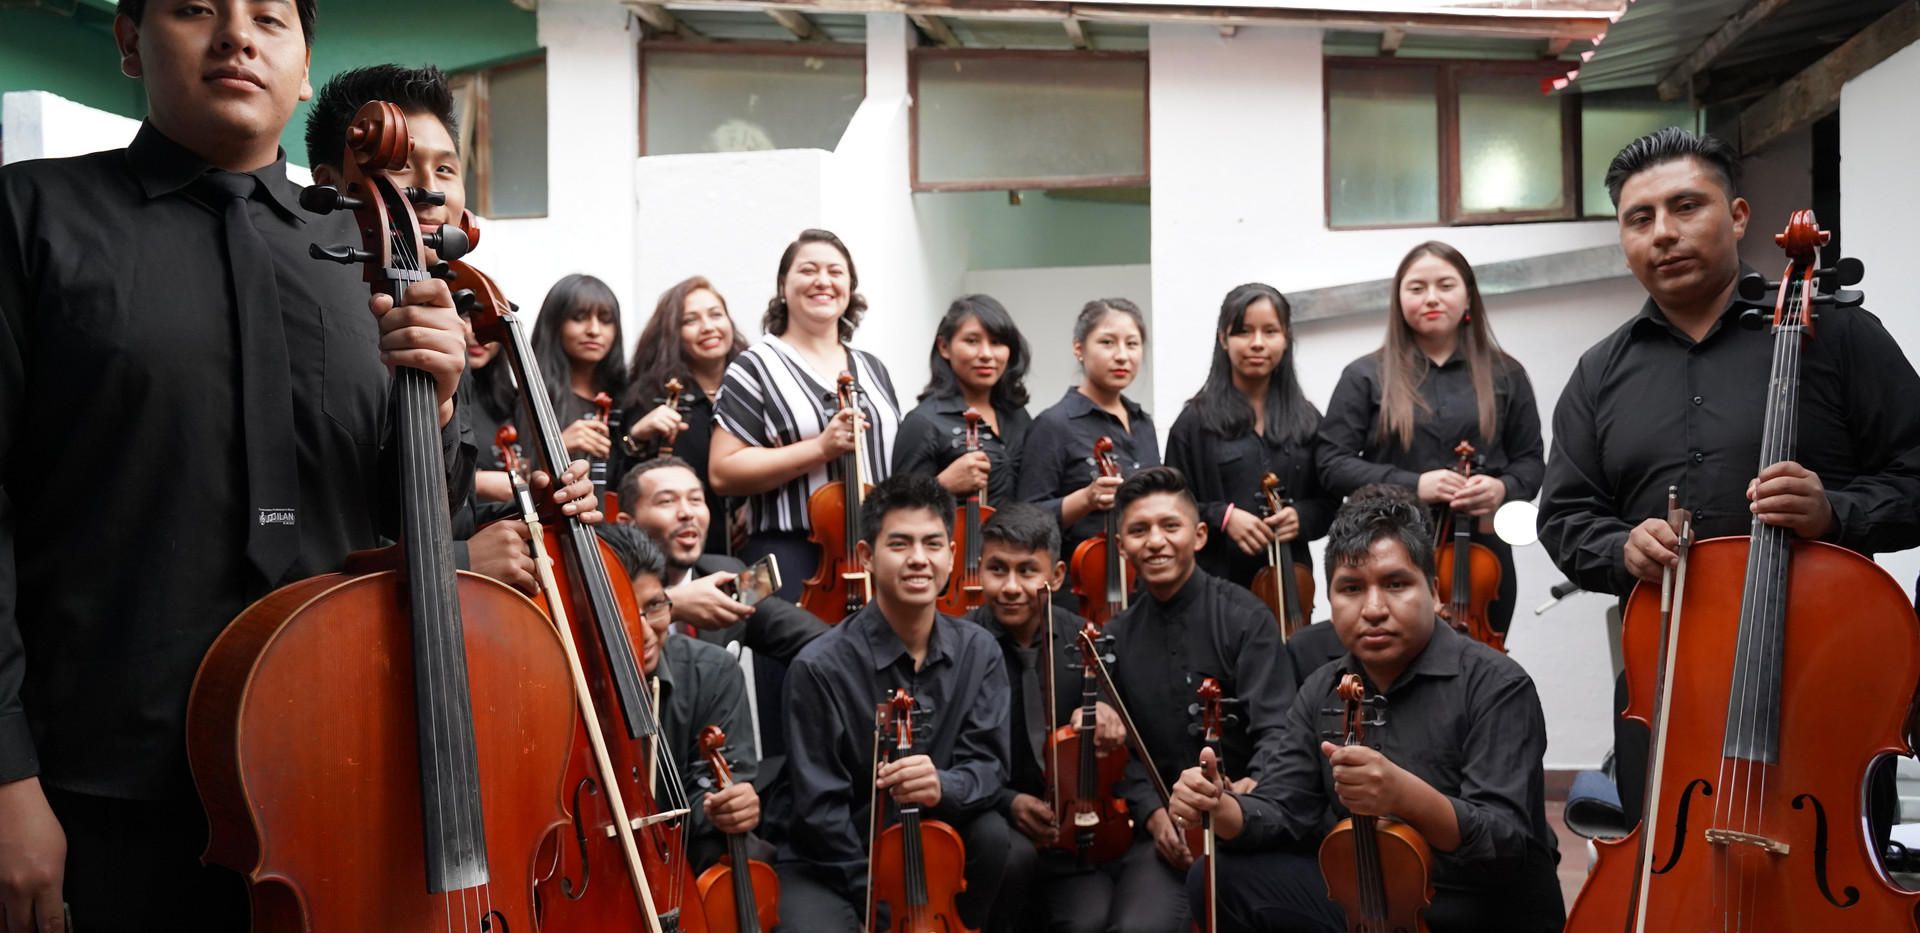 orquesta en bolivia